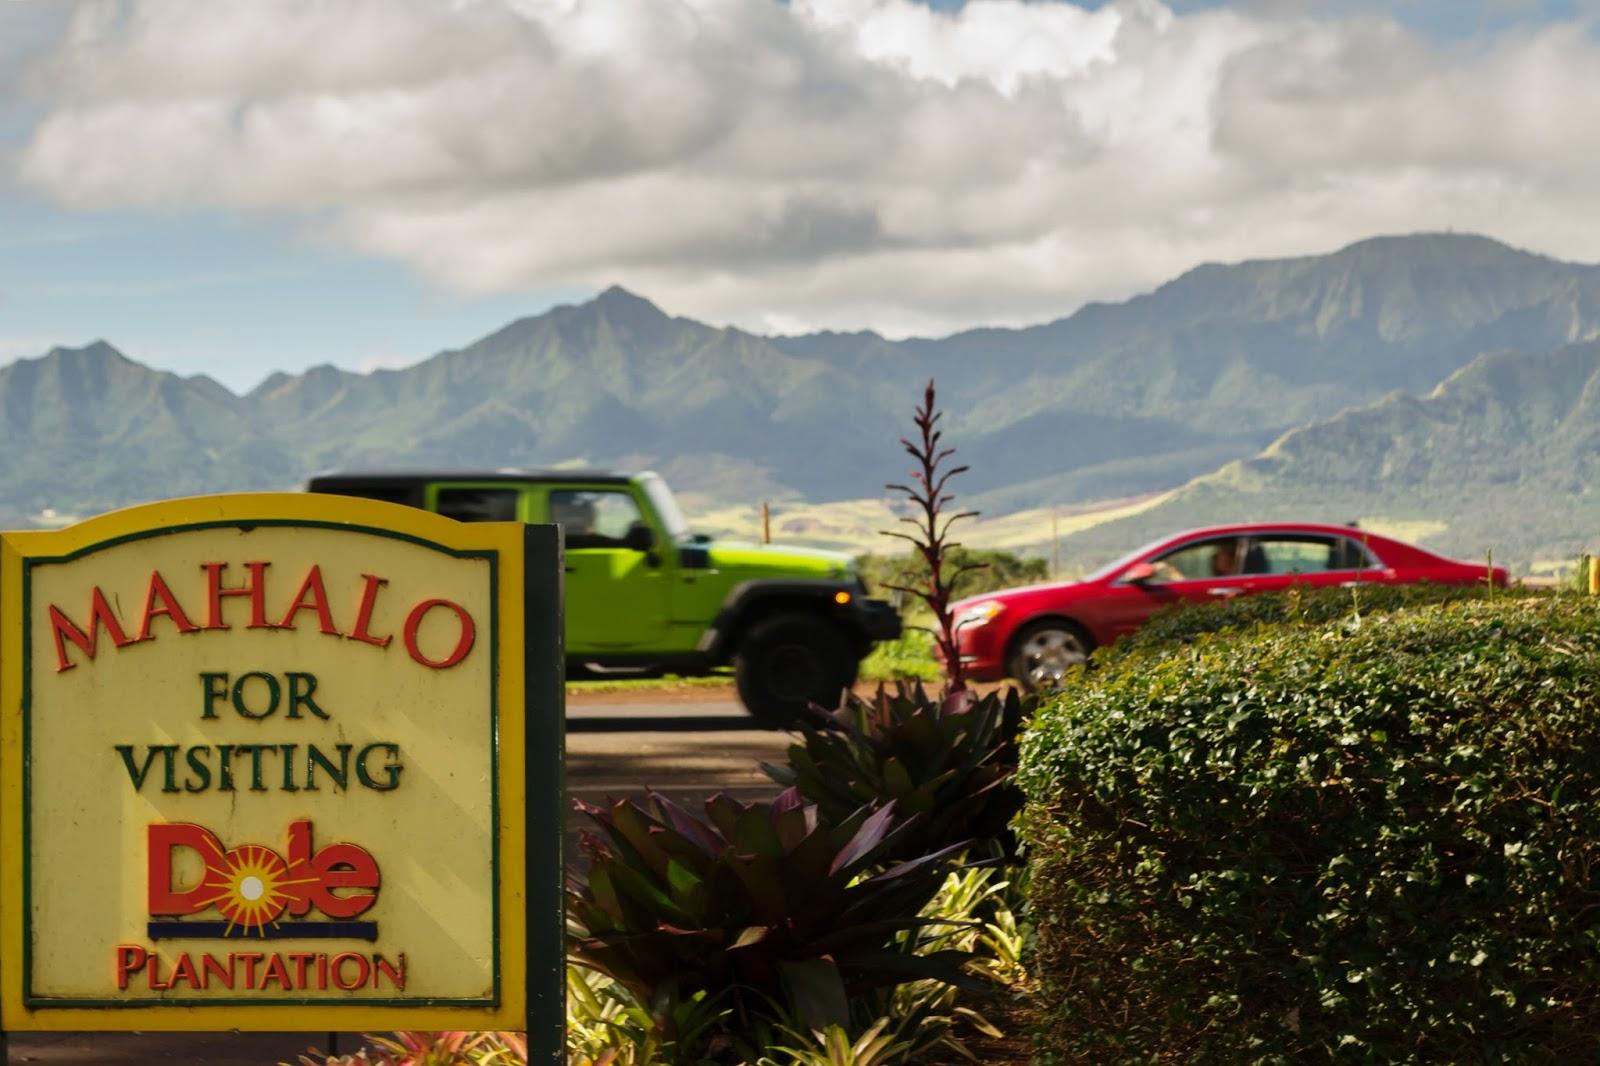 Dole Plantation in Oahu